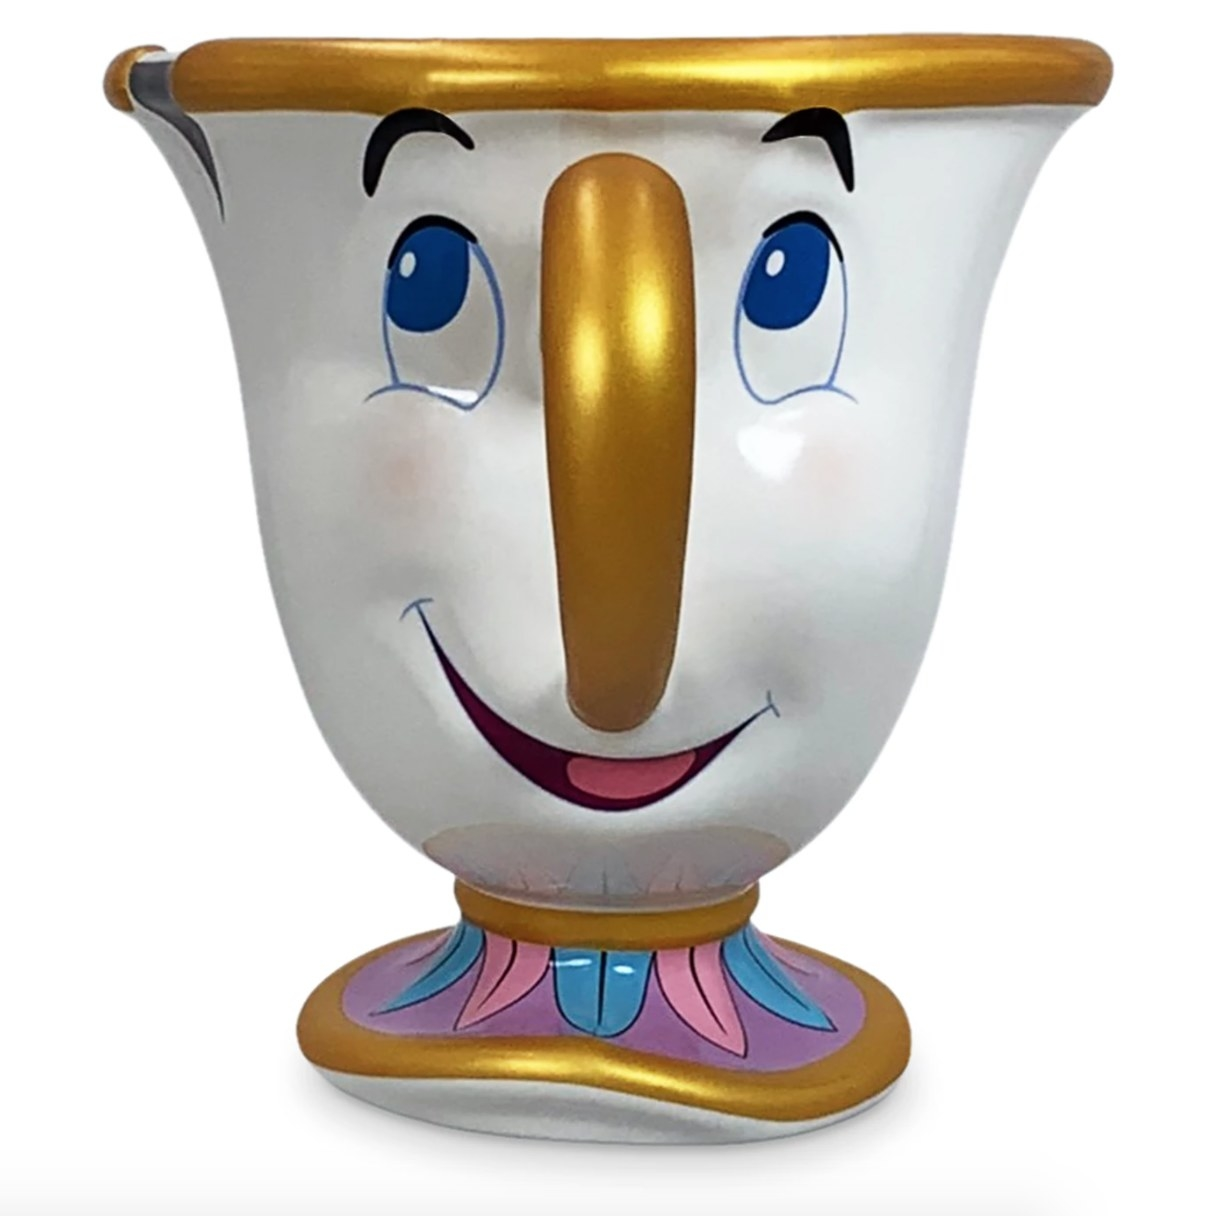 A mug shaped like Chip character from Beauty and the Beast